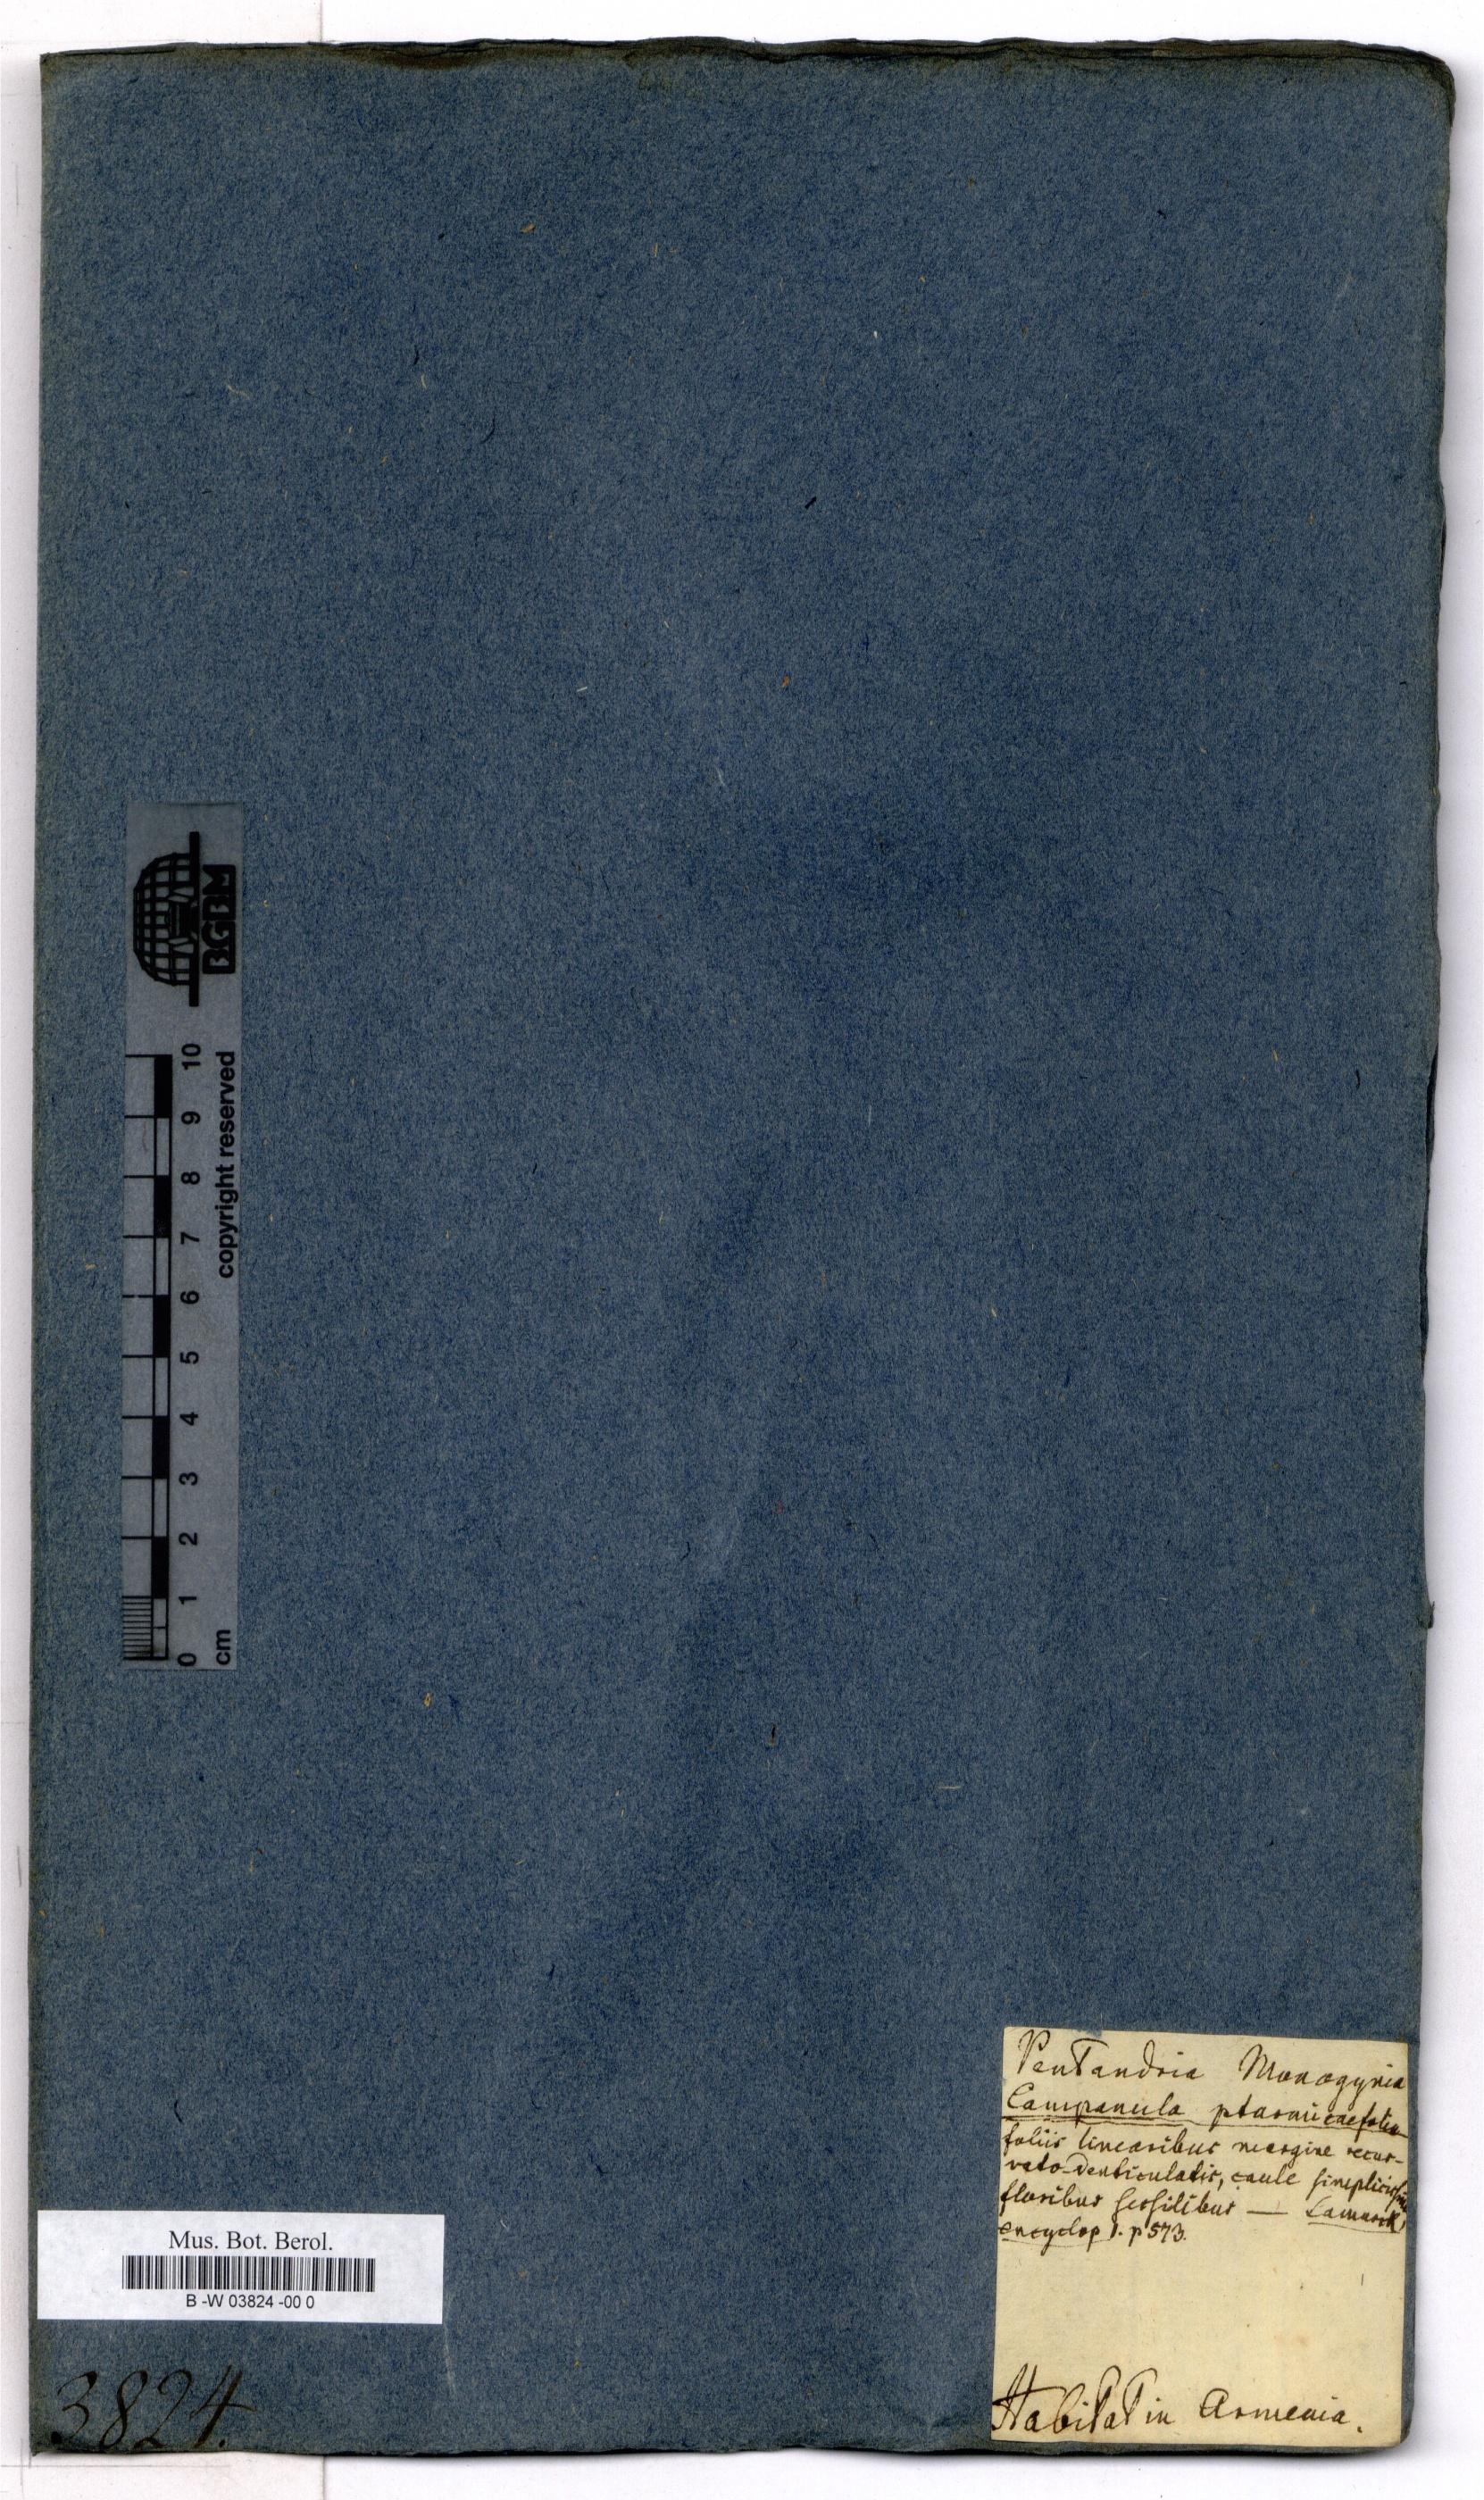 http://ww2.bgbm.org/herbarium/images/B/-W/03/82/B_-W_03824%20-00%200__3.jpg